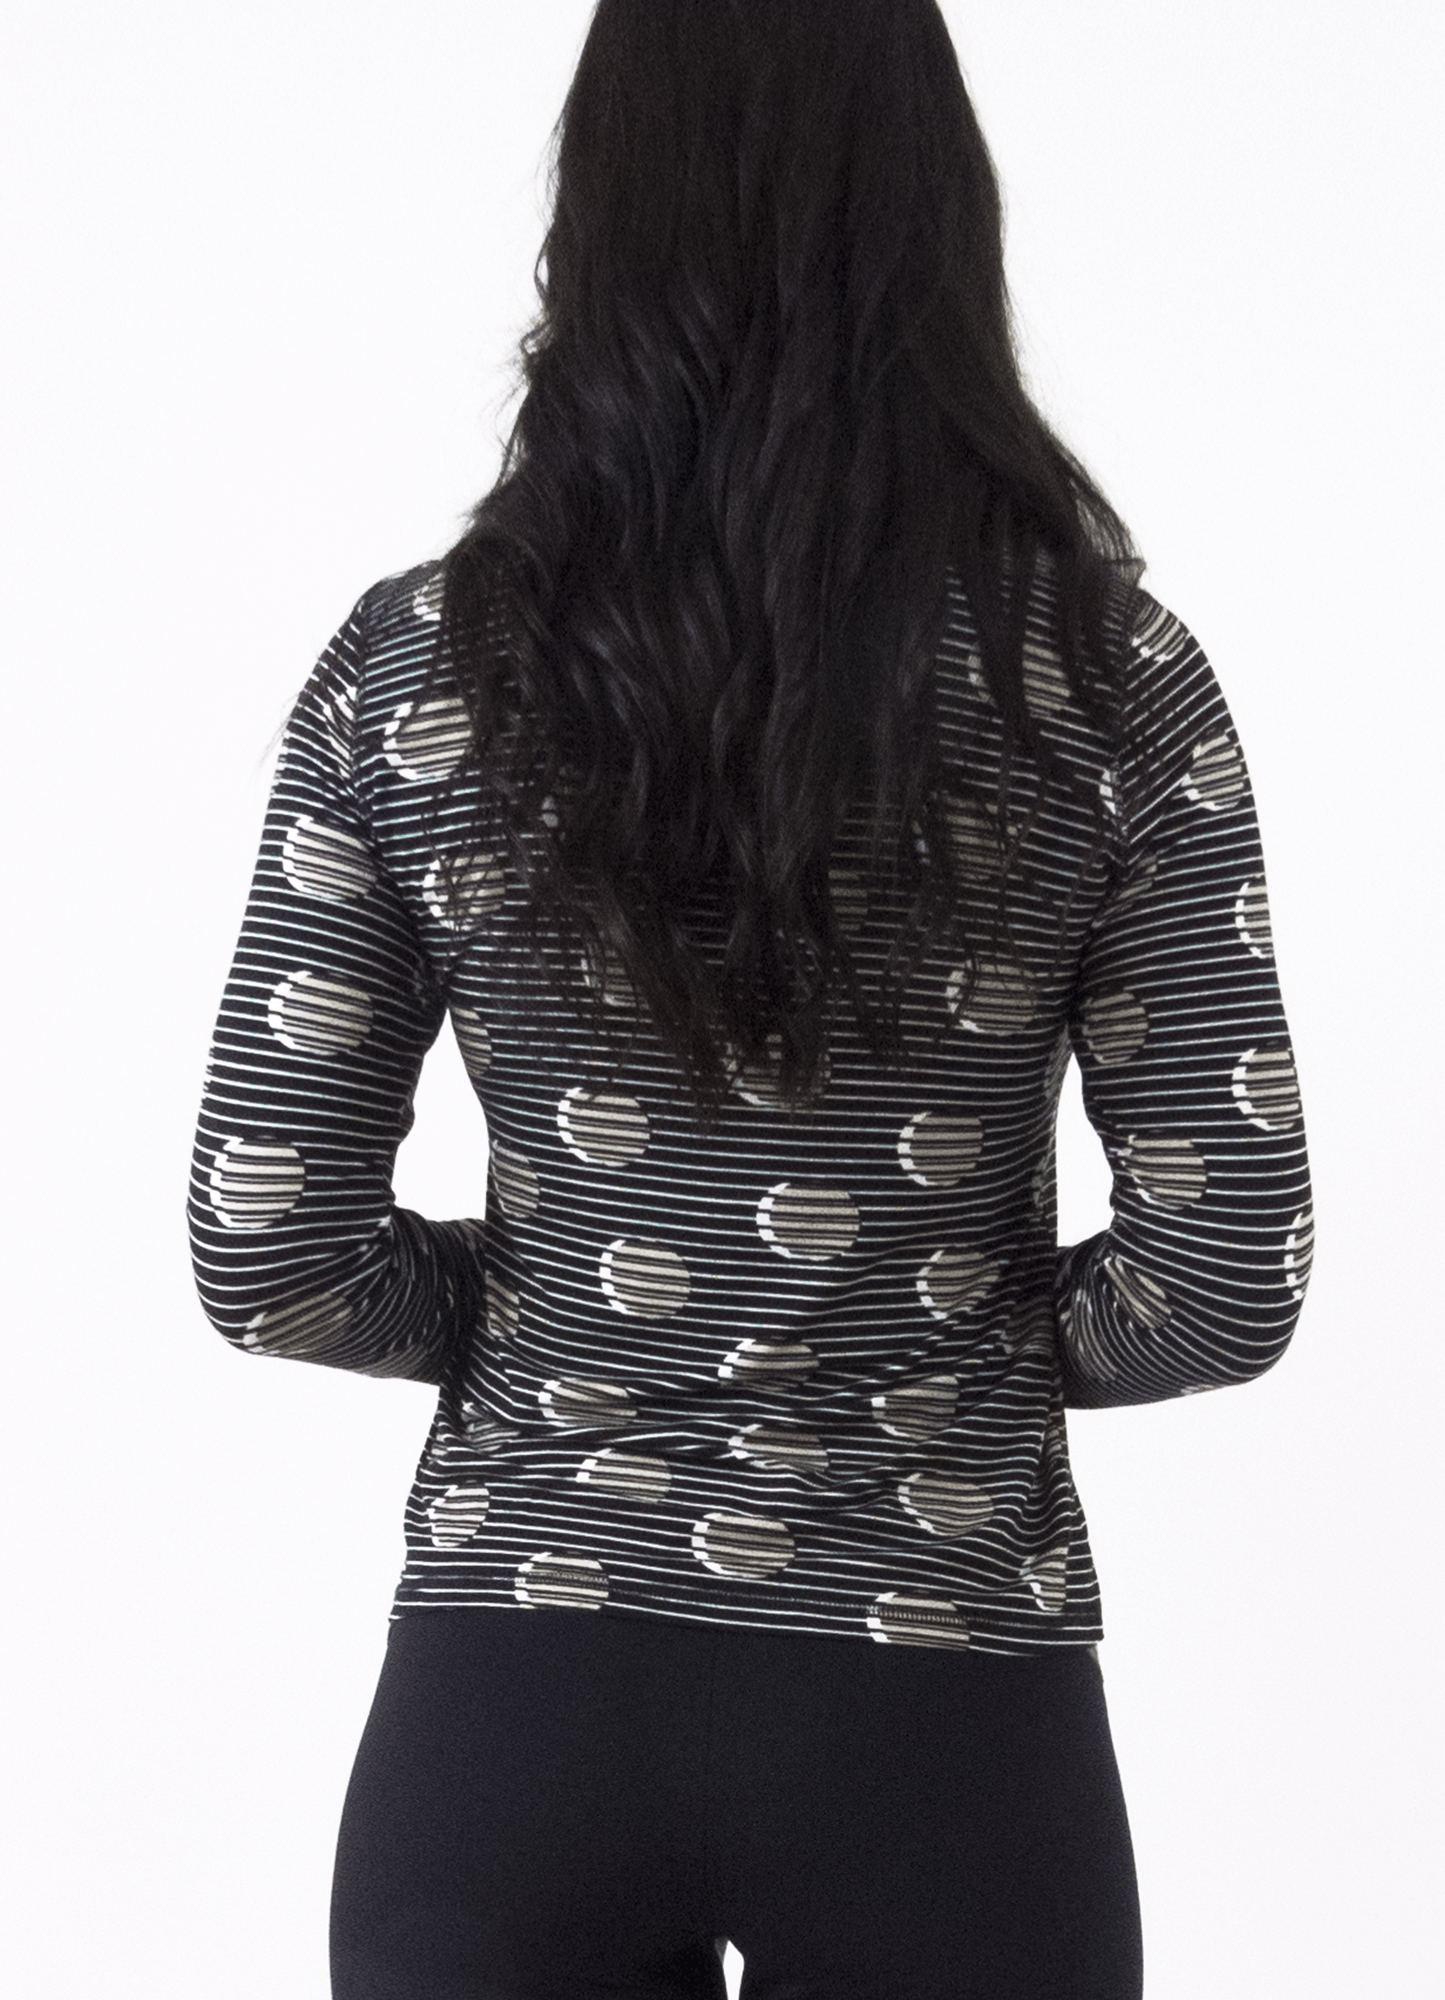 Blusa Feminina Viscose Listrada Estampada Preta e Branca Cacharrel